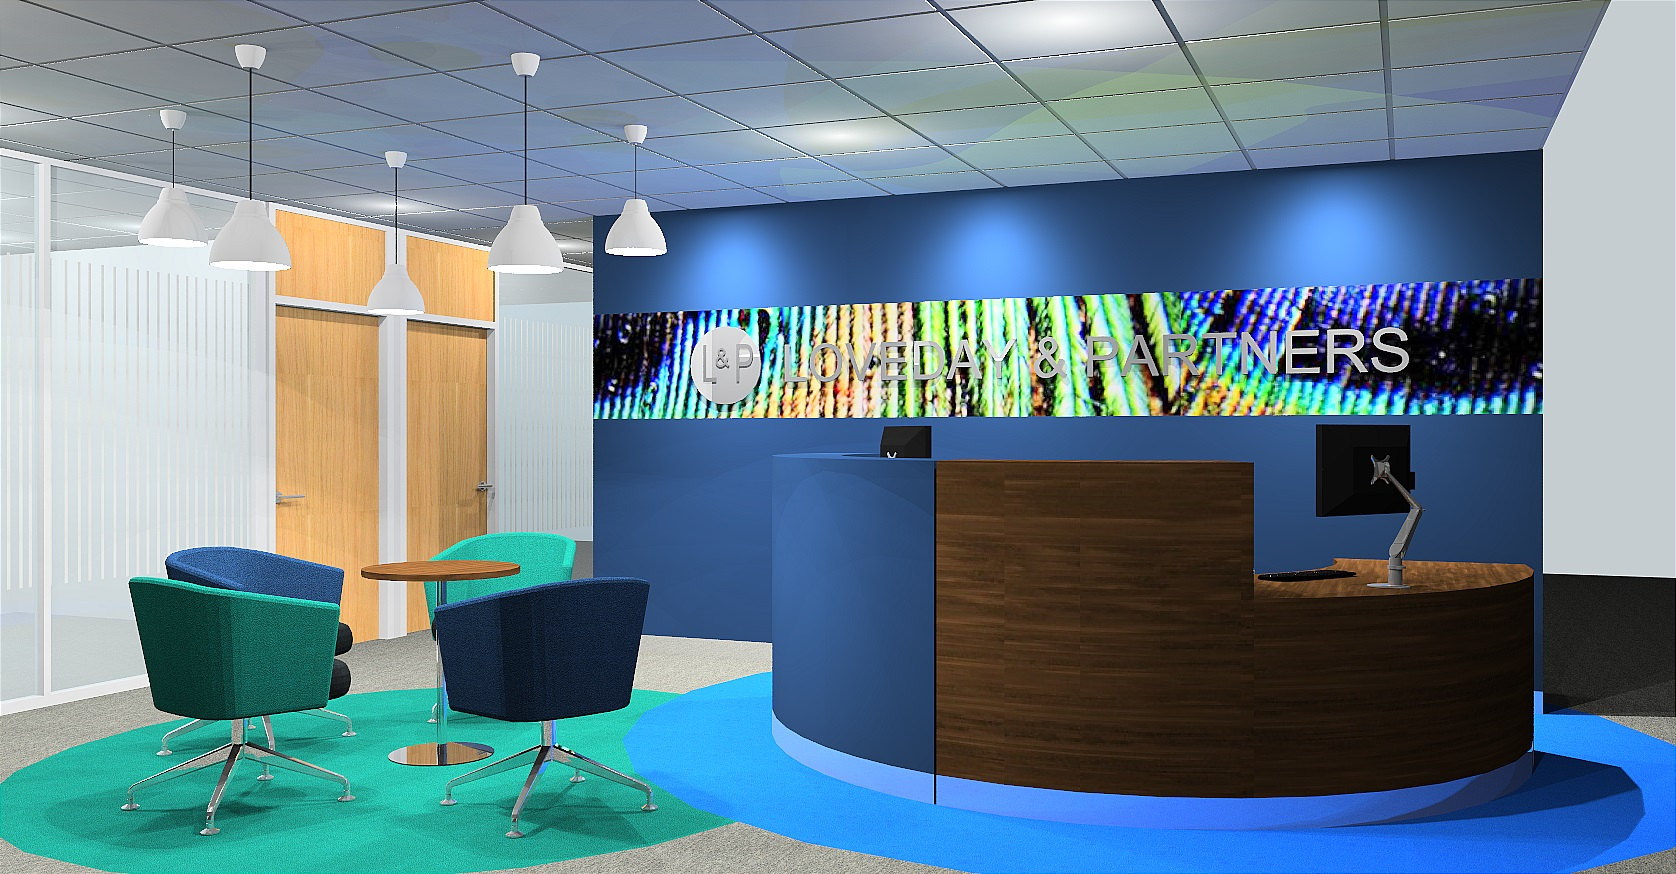 Loveday reception office design render